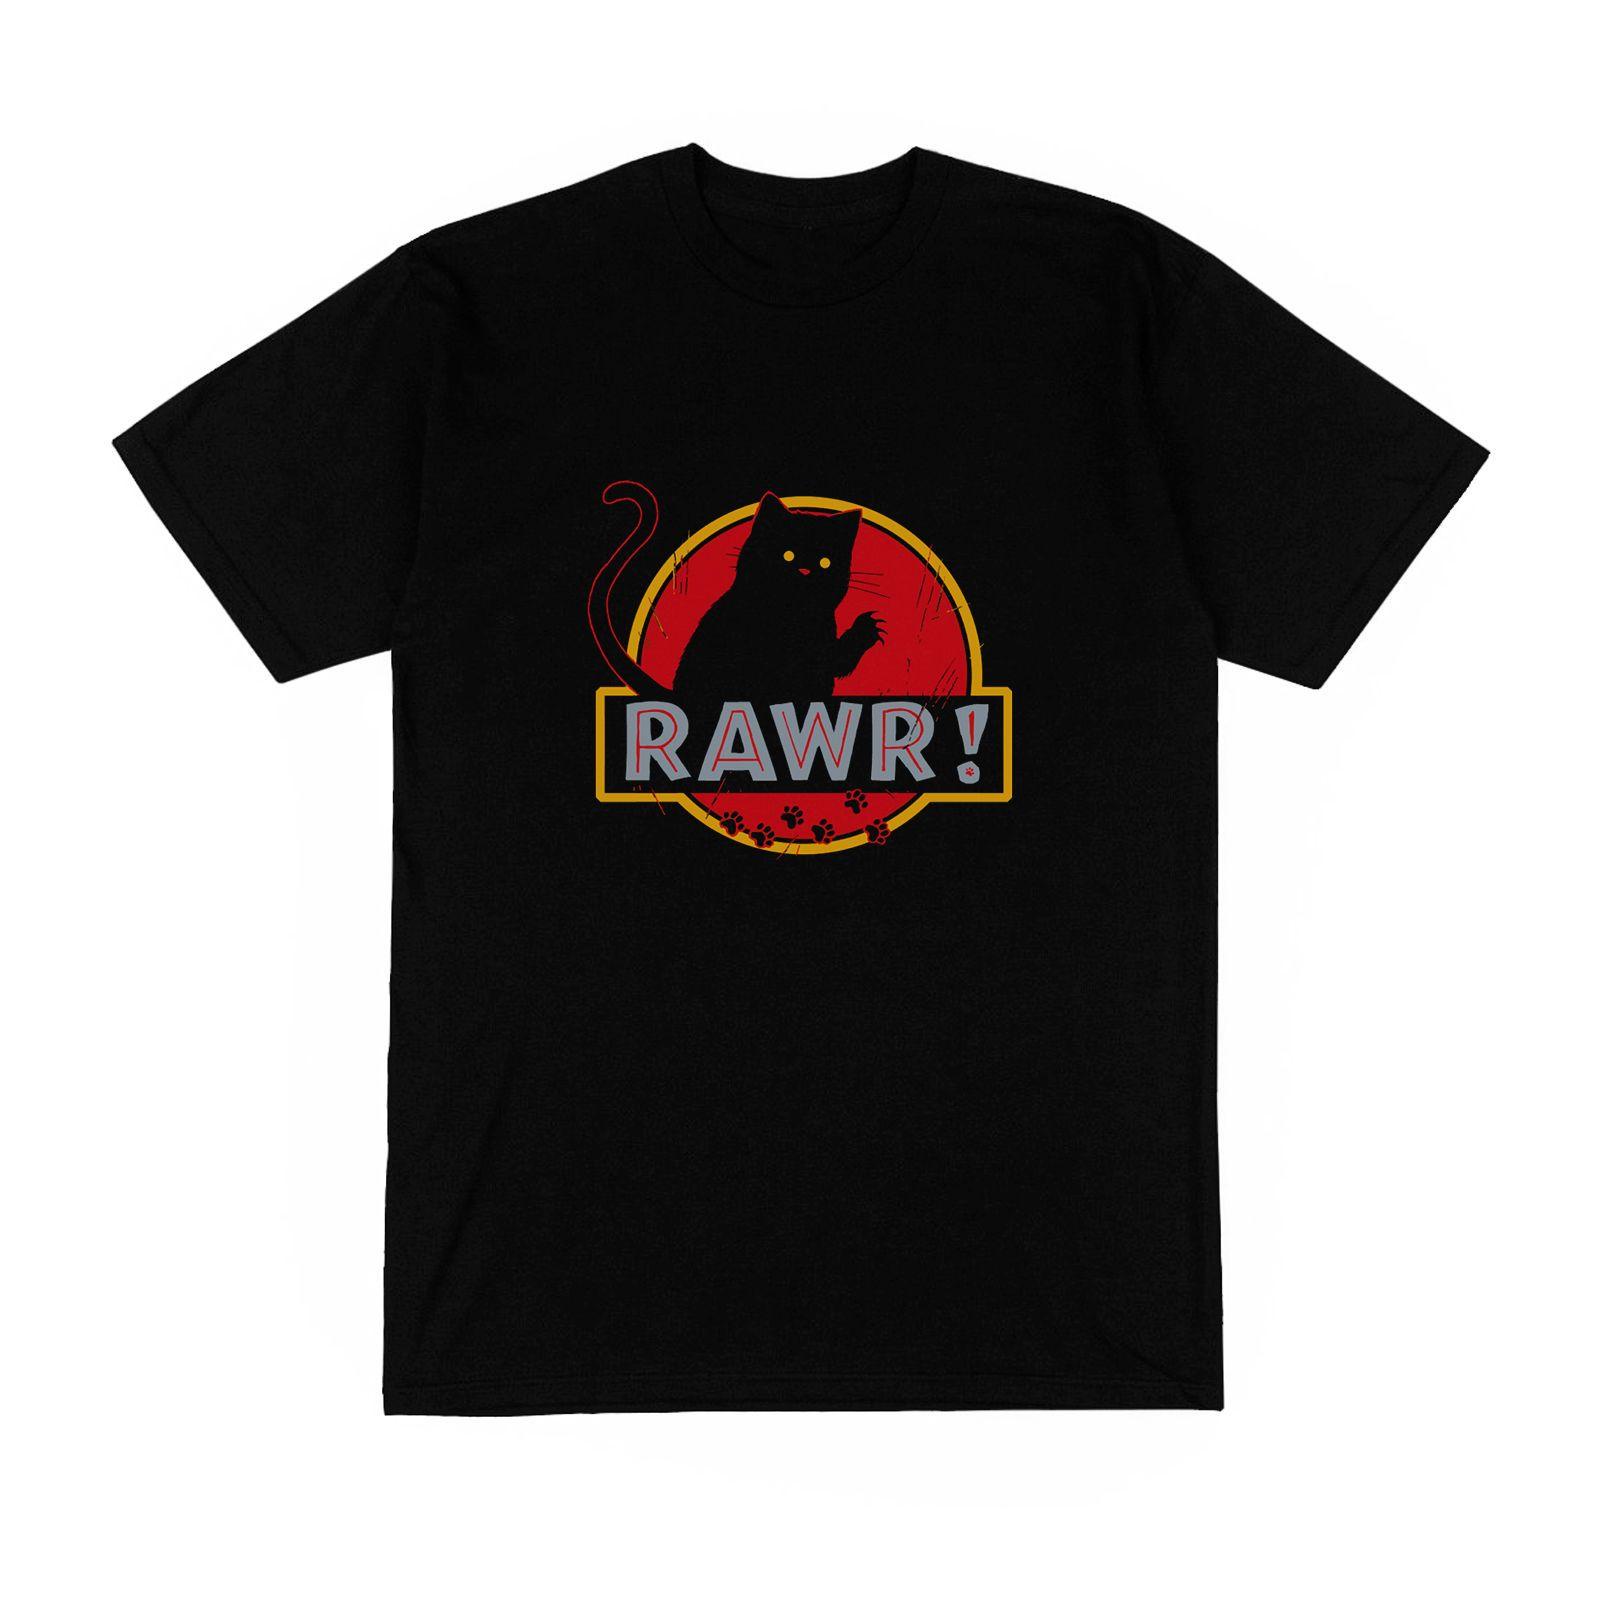 Grosshandel T Shirt Homme Noir Rawr Jurassic Park Chat Detournement